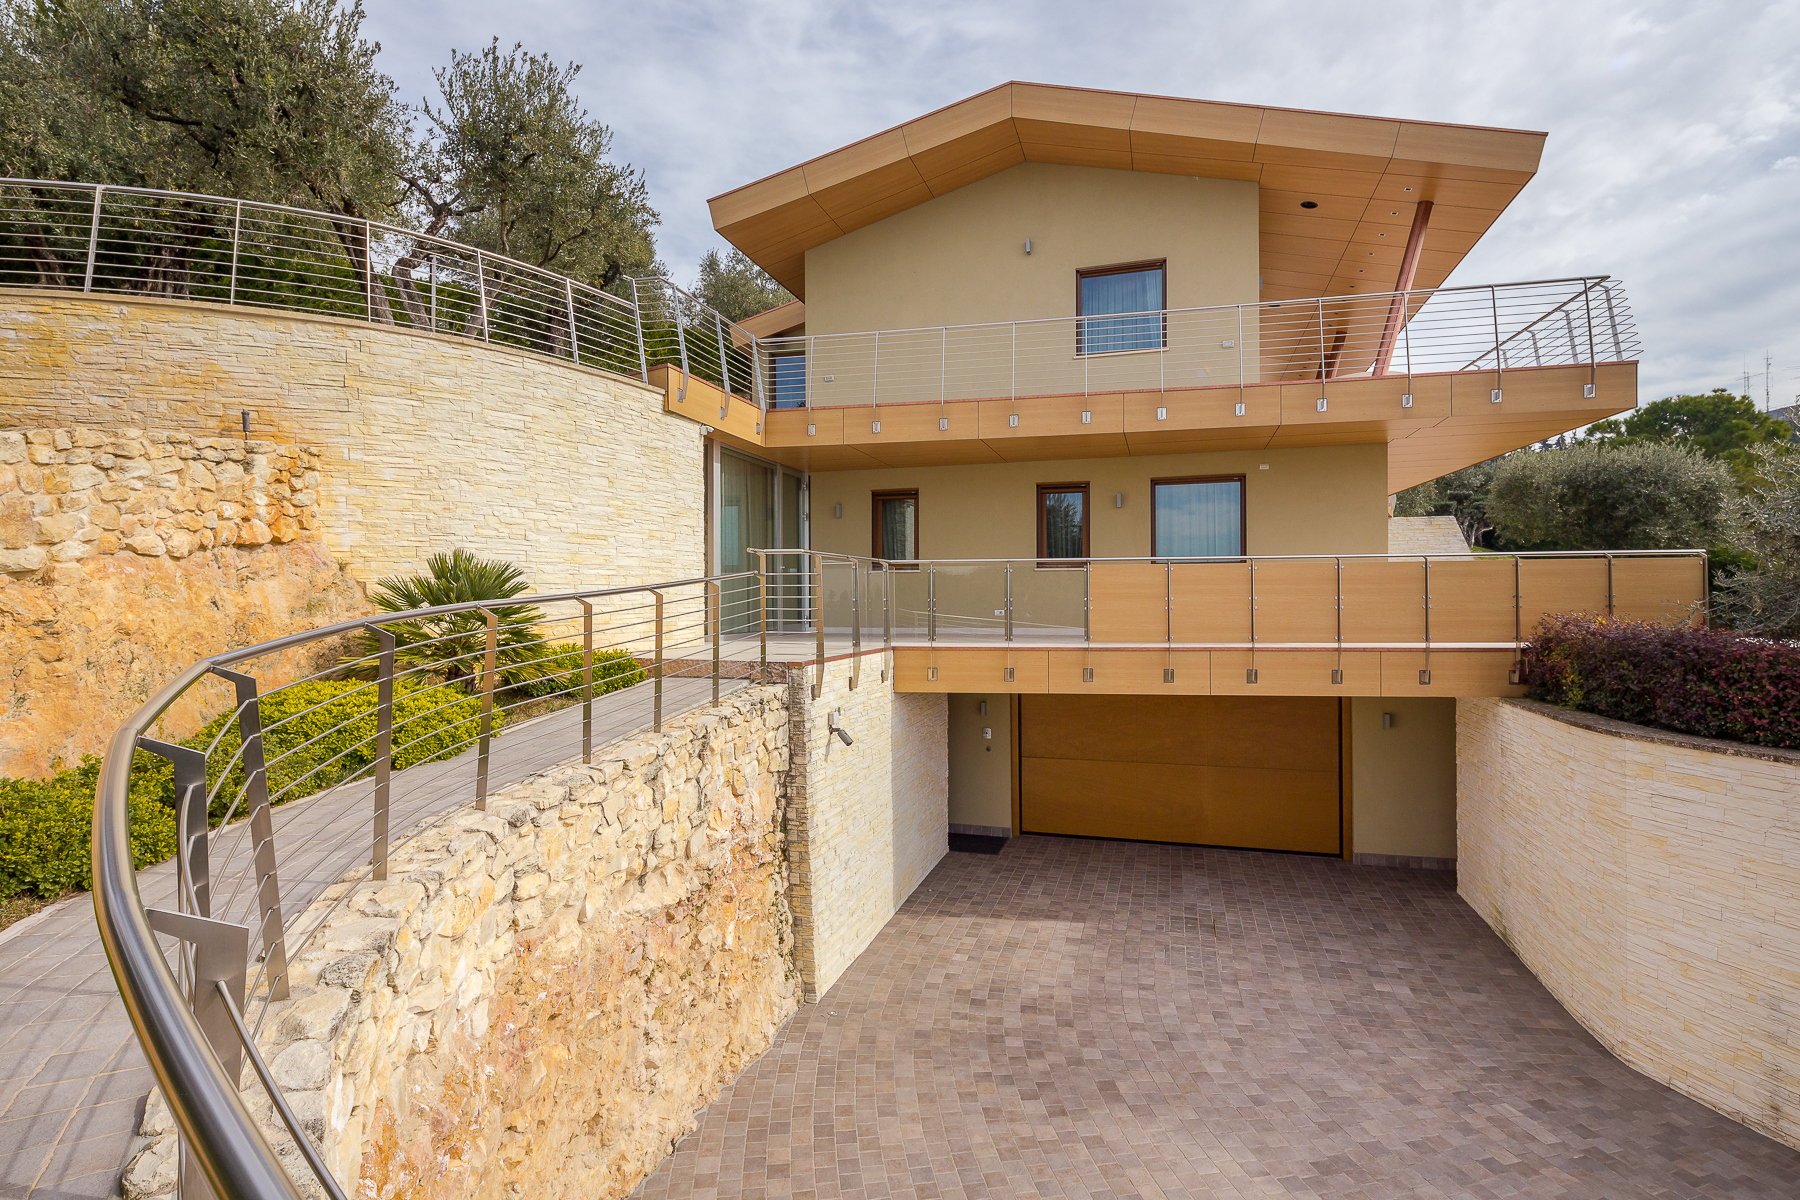 Villa in Vendita a Verona: 5 locali, 630 mq - Foto 23